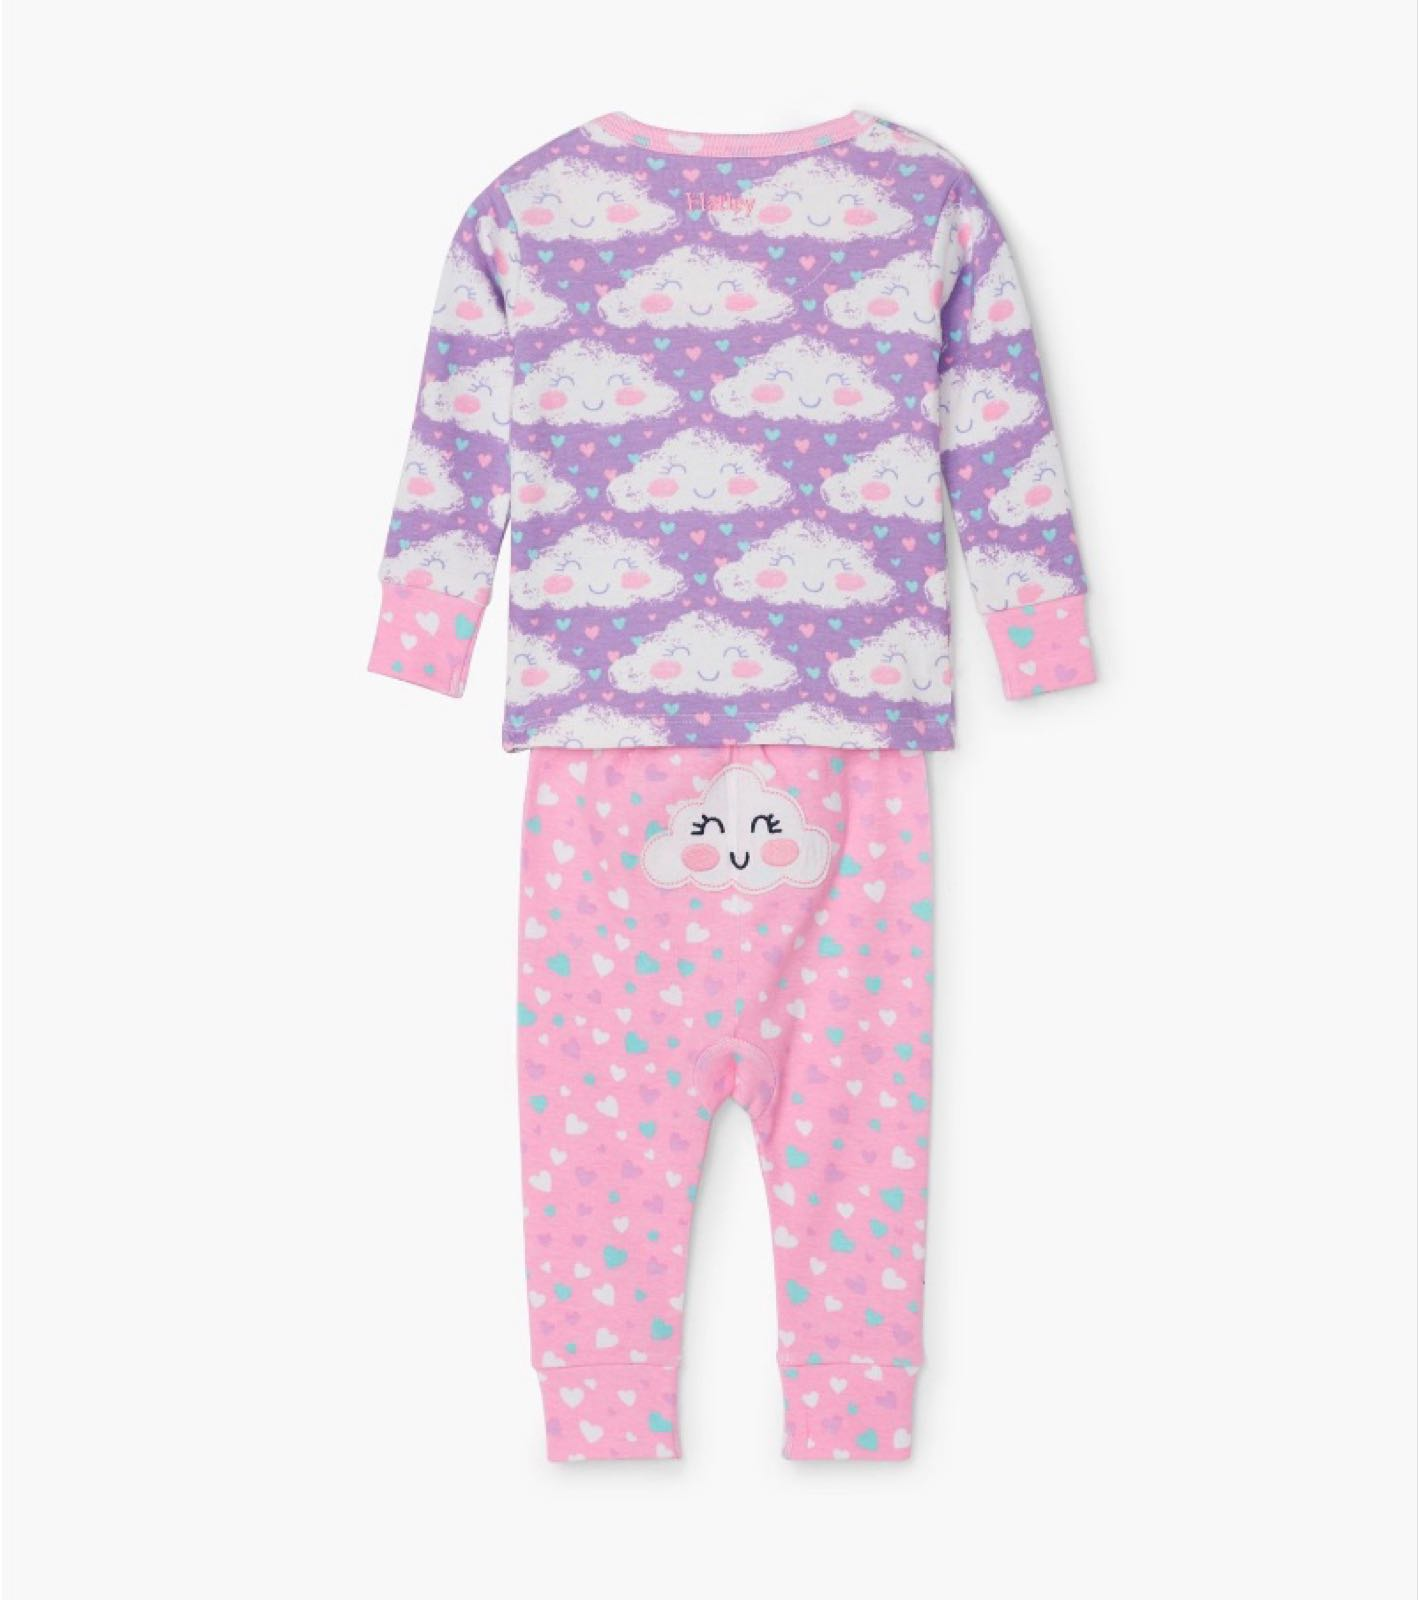 Hatley Cheerful Clouds Organic Cotton Baby Pyjamas